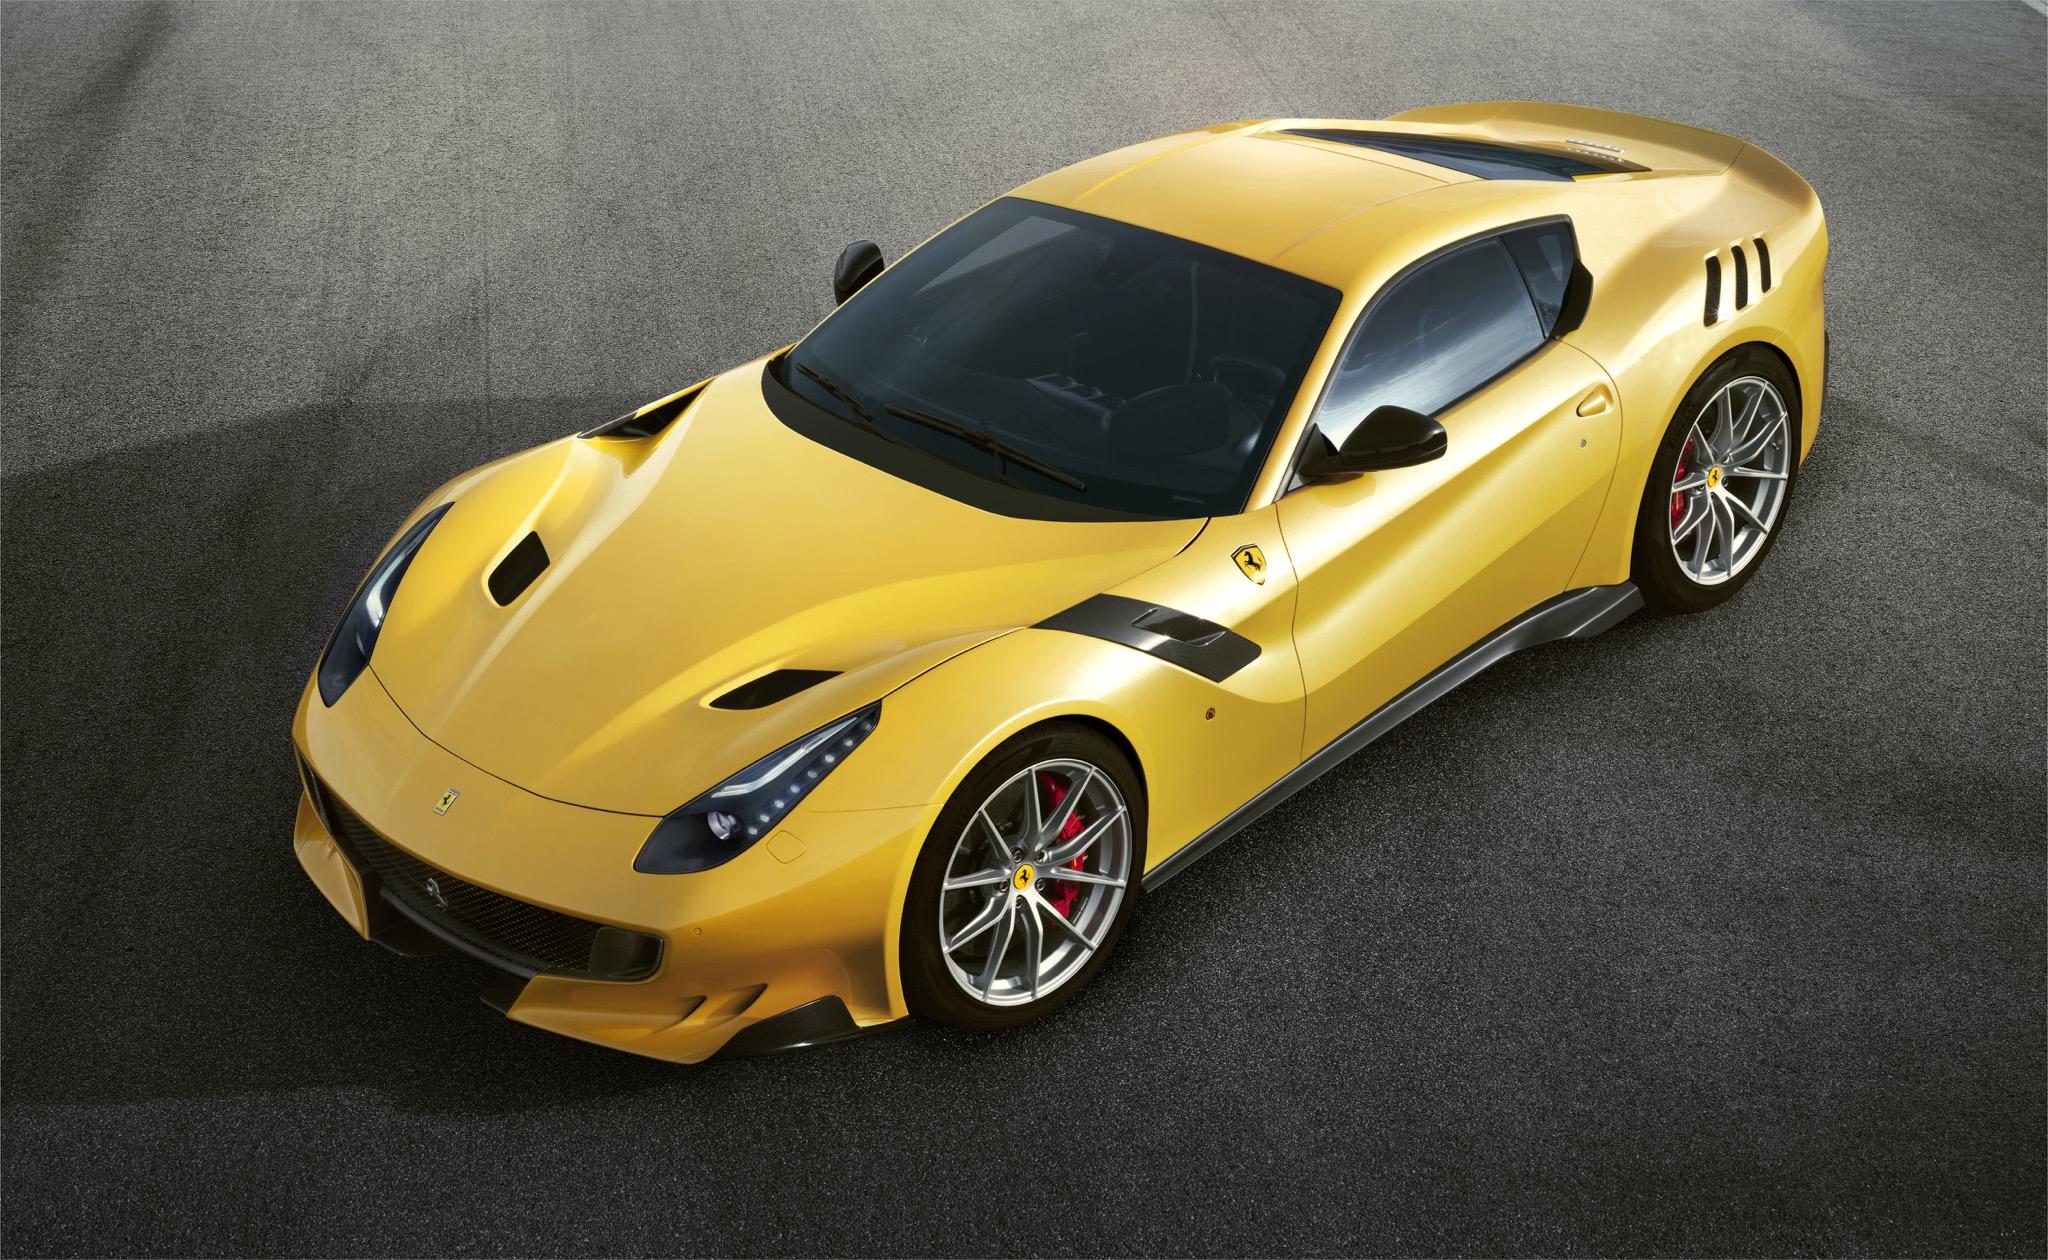 FerrariF12tdf 01